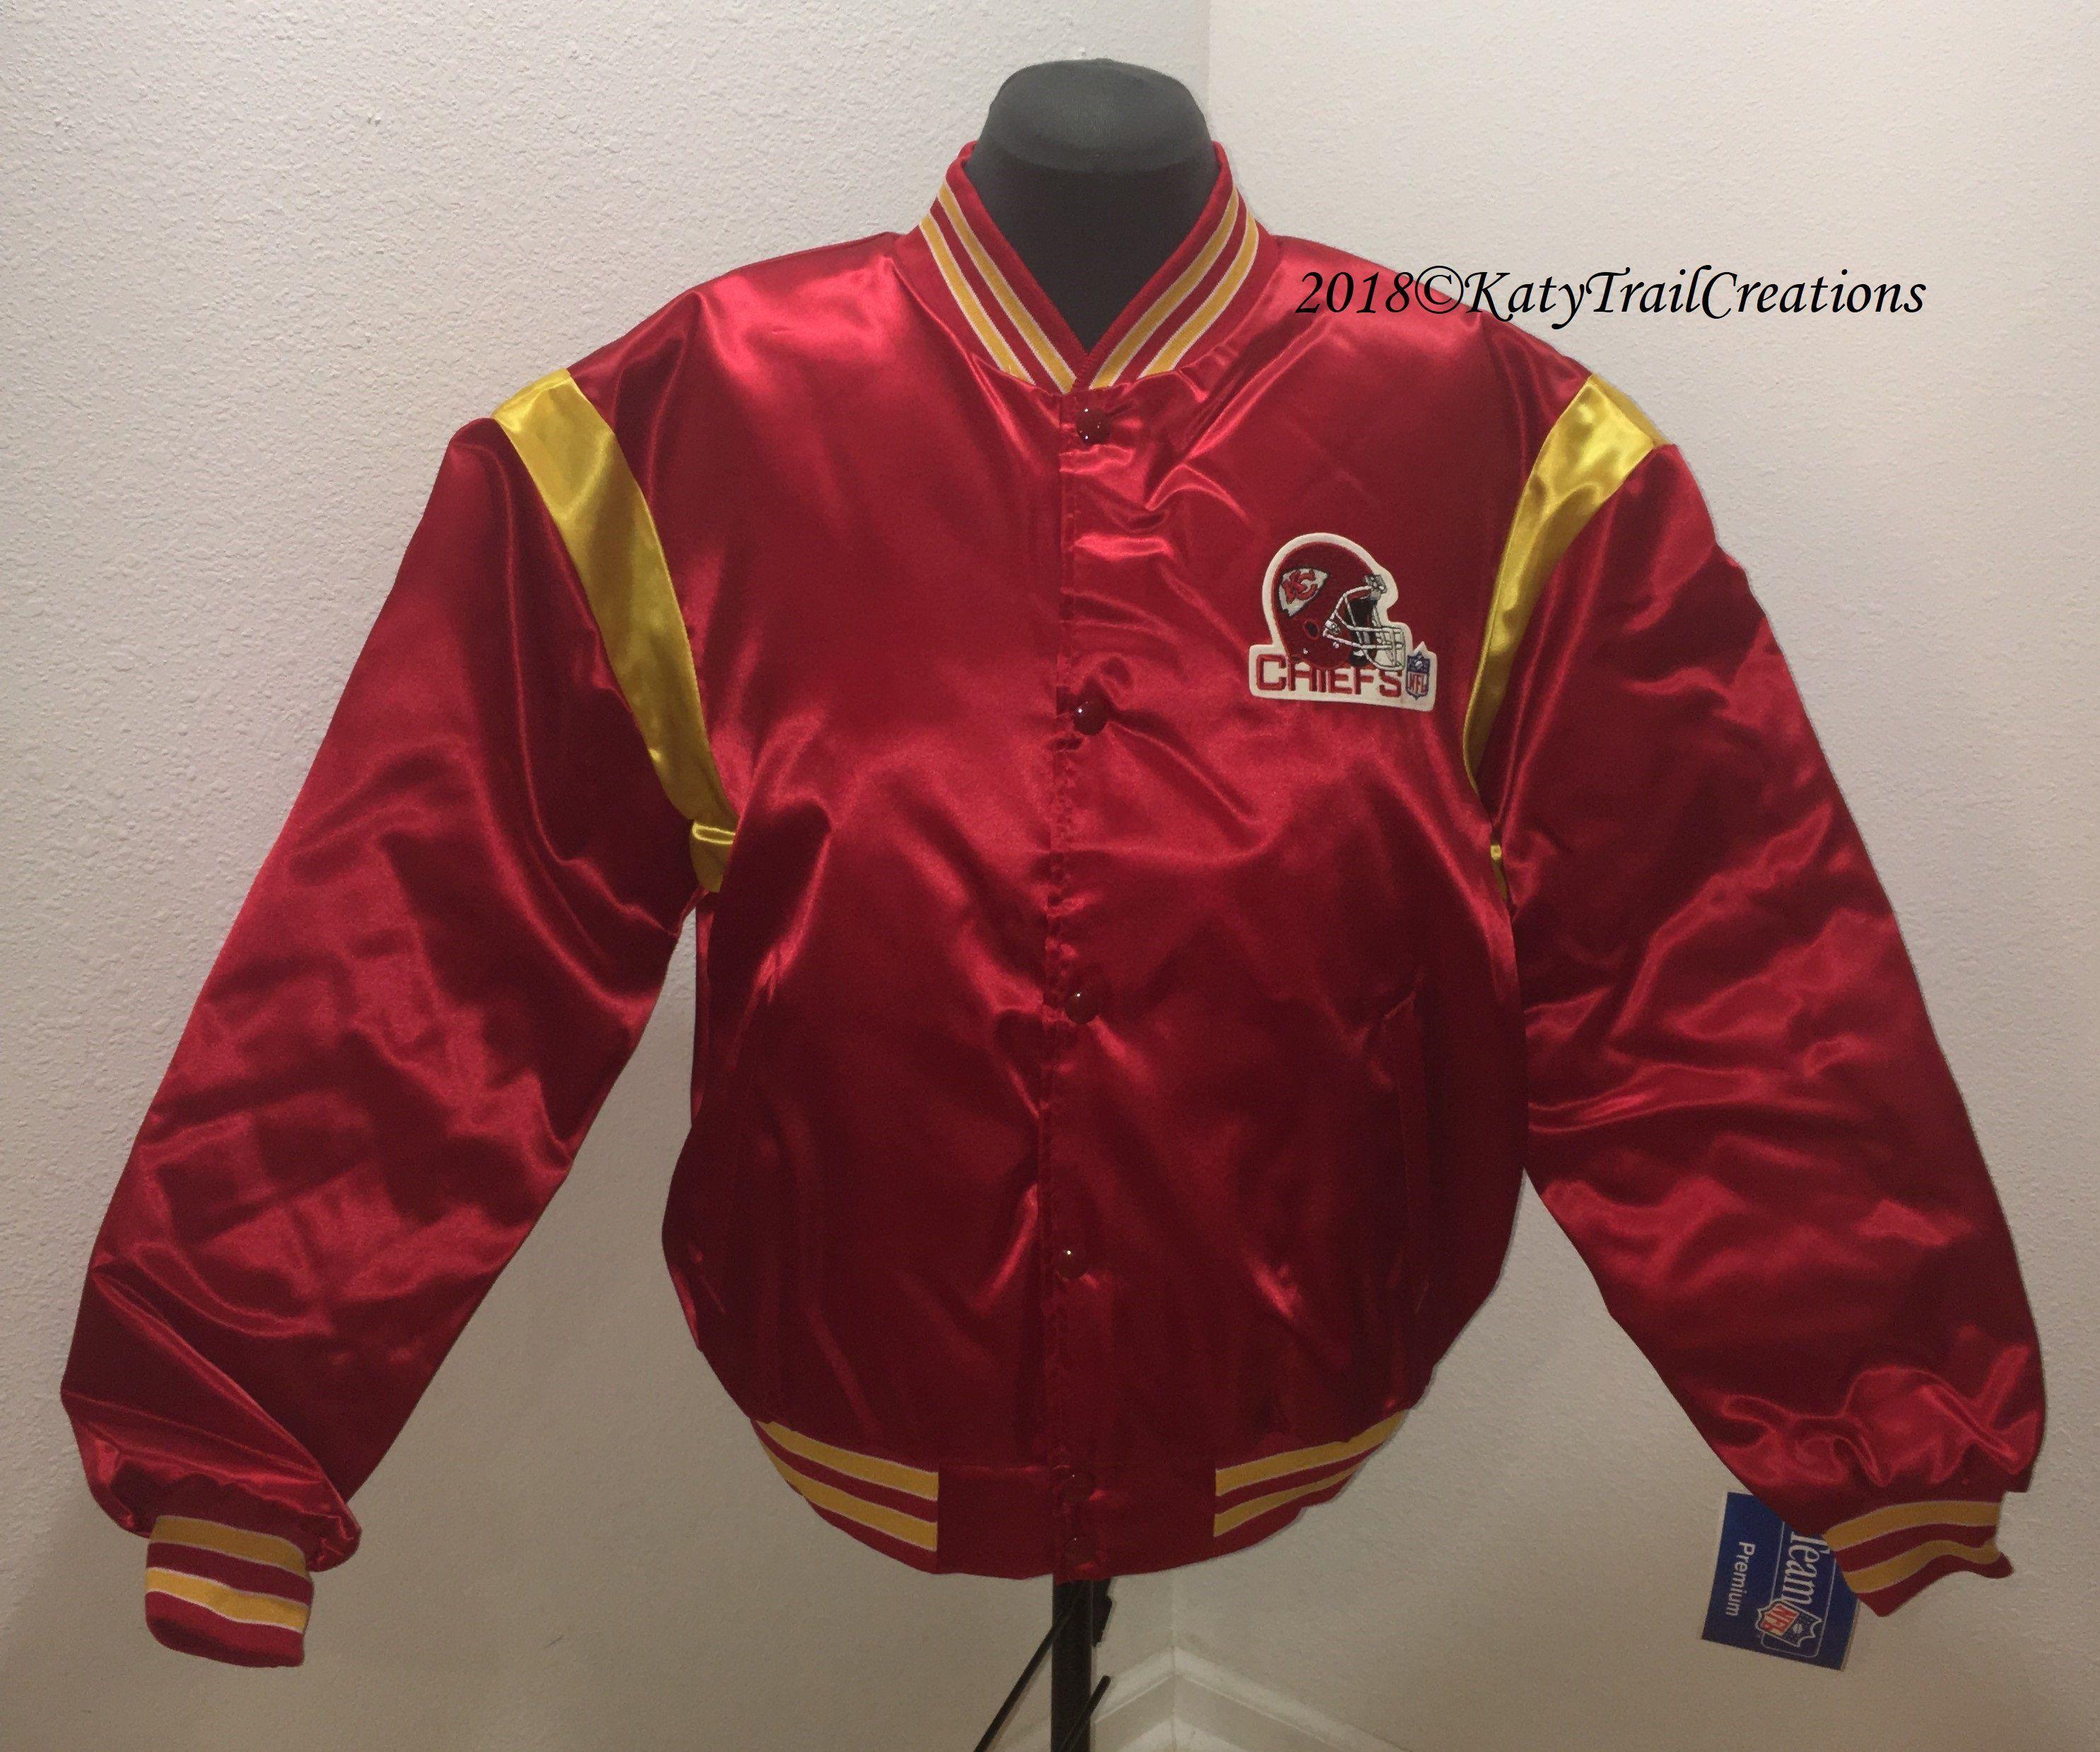 Vintage Brand New 1992 Nfl Kansas City Chiefs Bomber Jacket Etsy Bomber Jacket Etsy Vintage Branding Jackets [ 2479 x 2971 Pixel ]